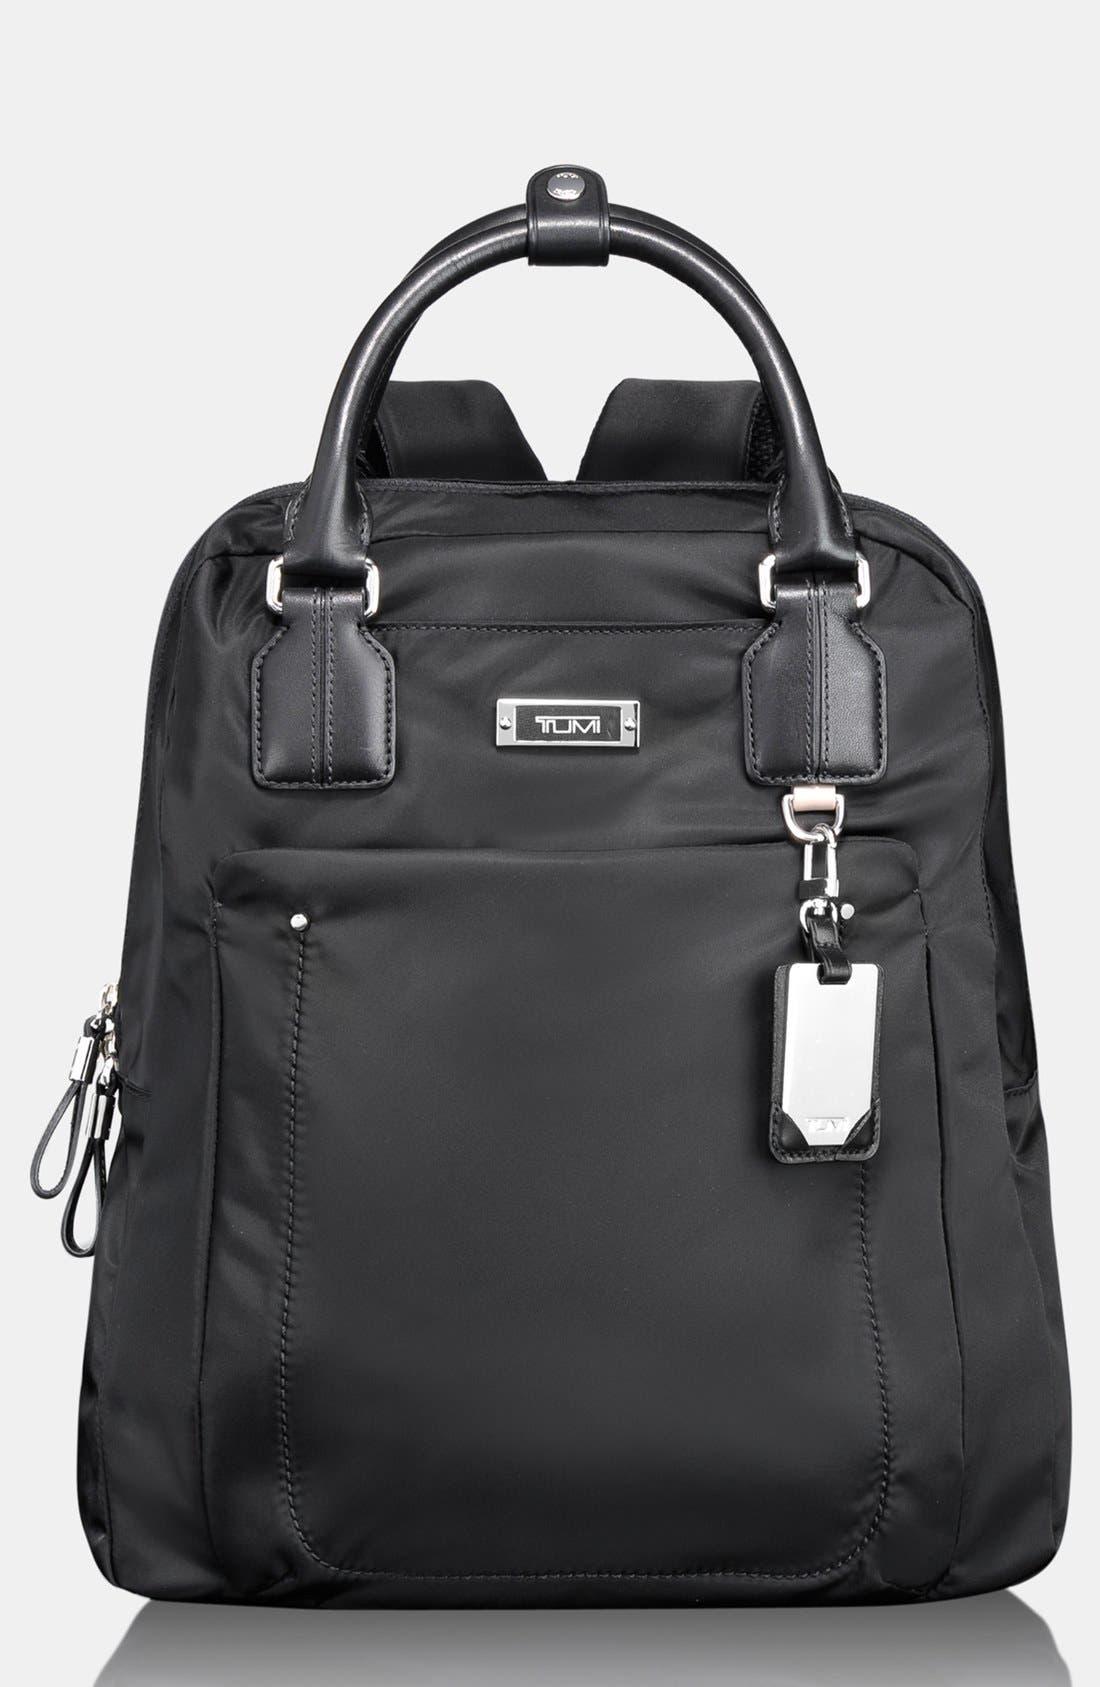 TUMI 'Voyager - Ascot' Convertible Backpack, Main, color, 001